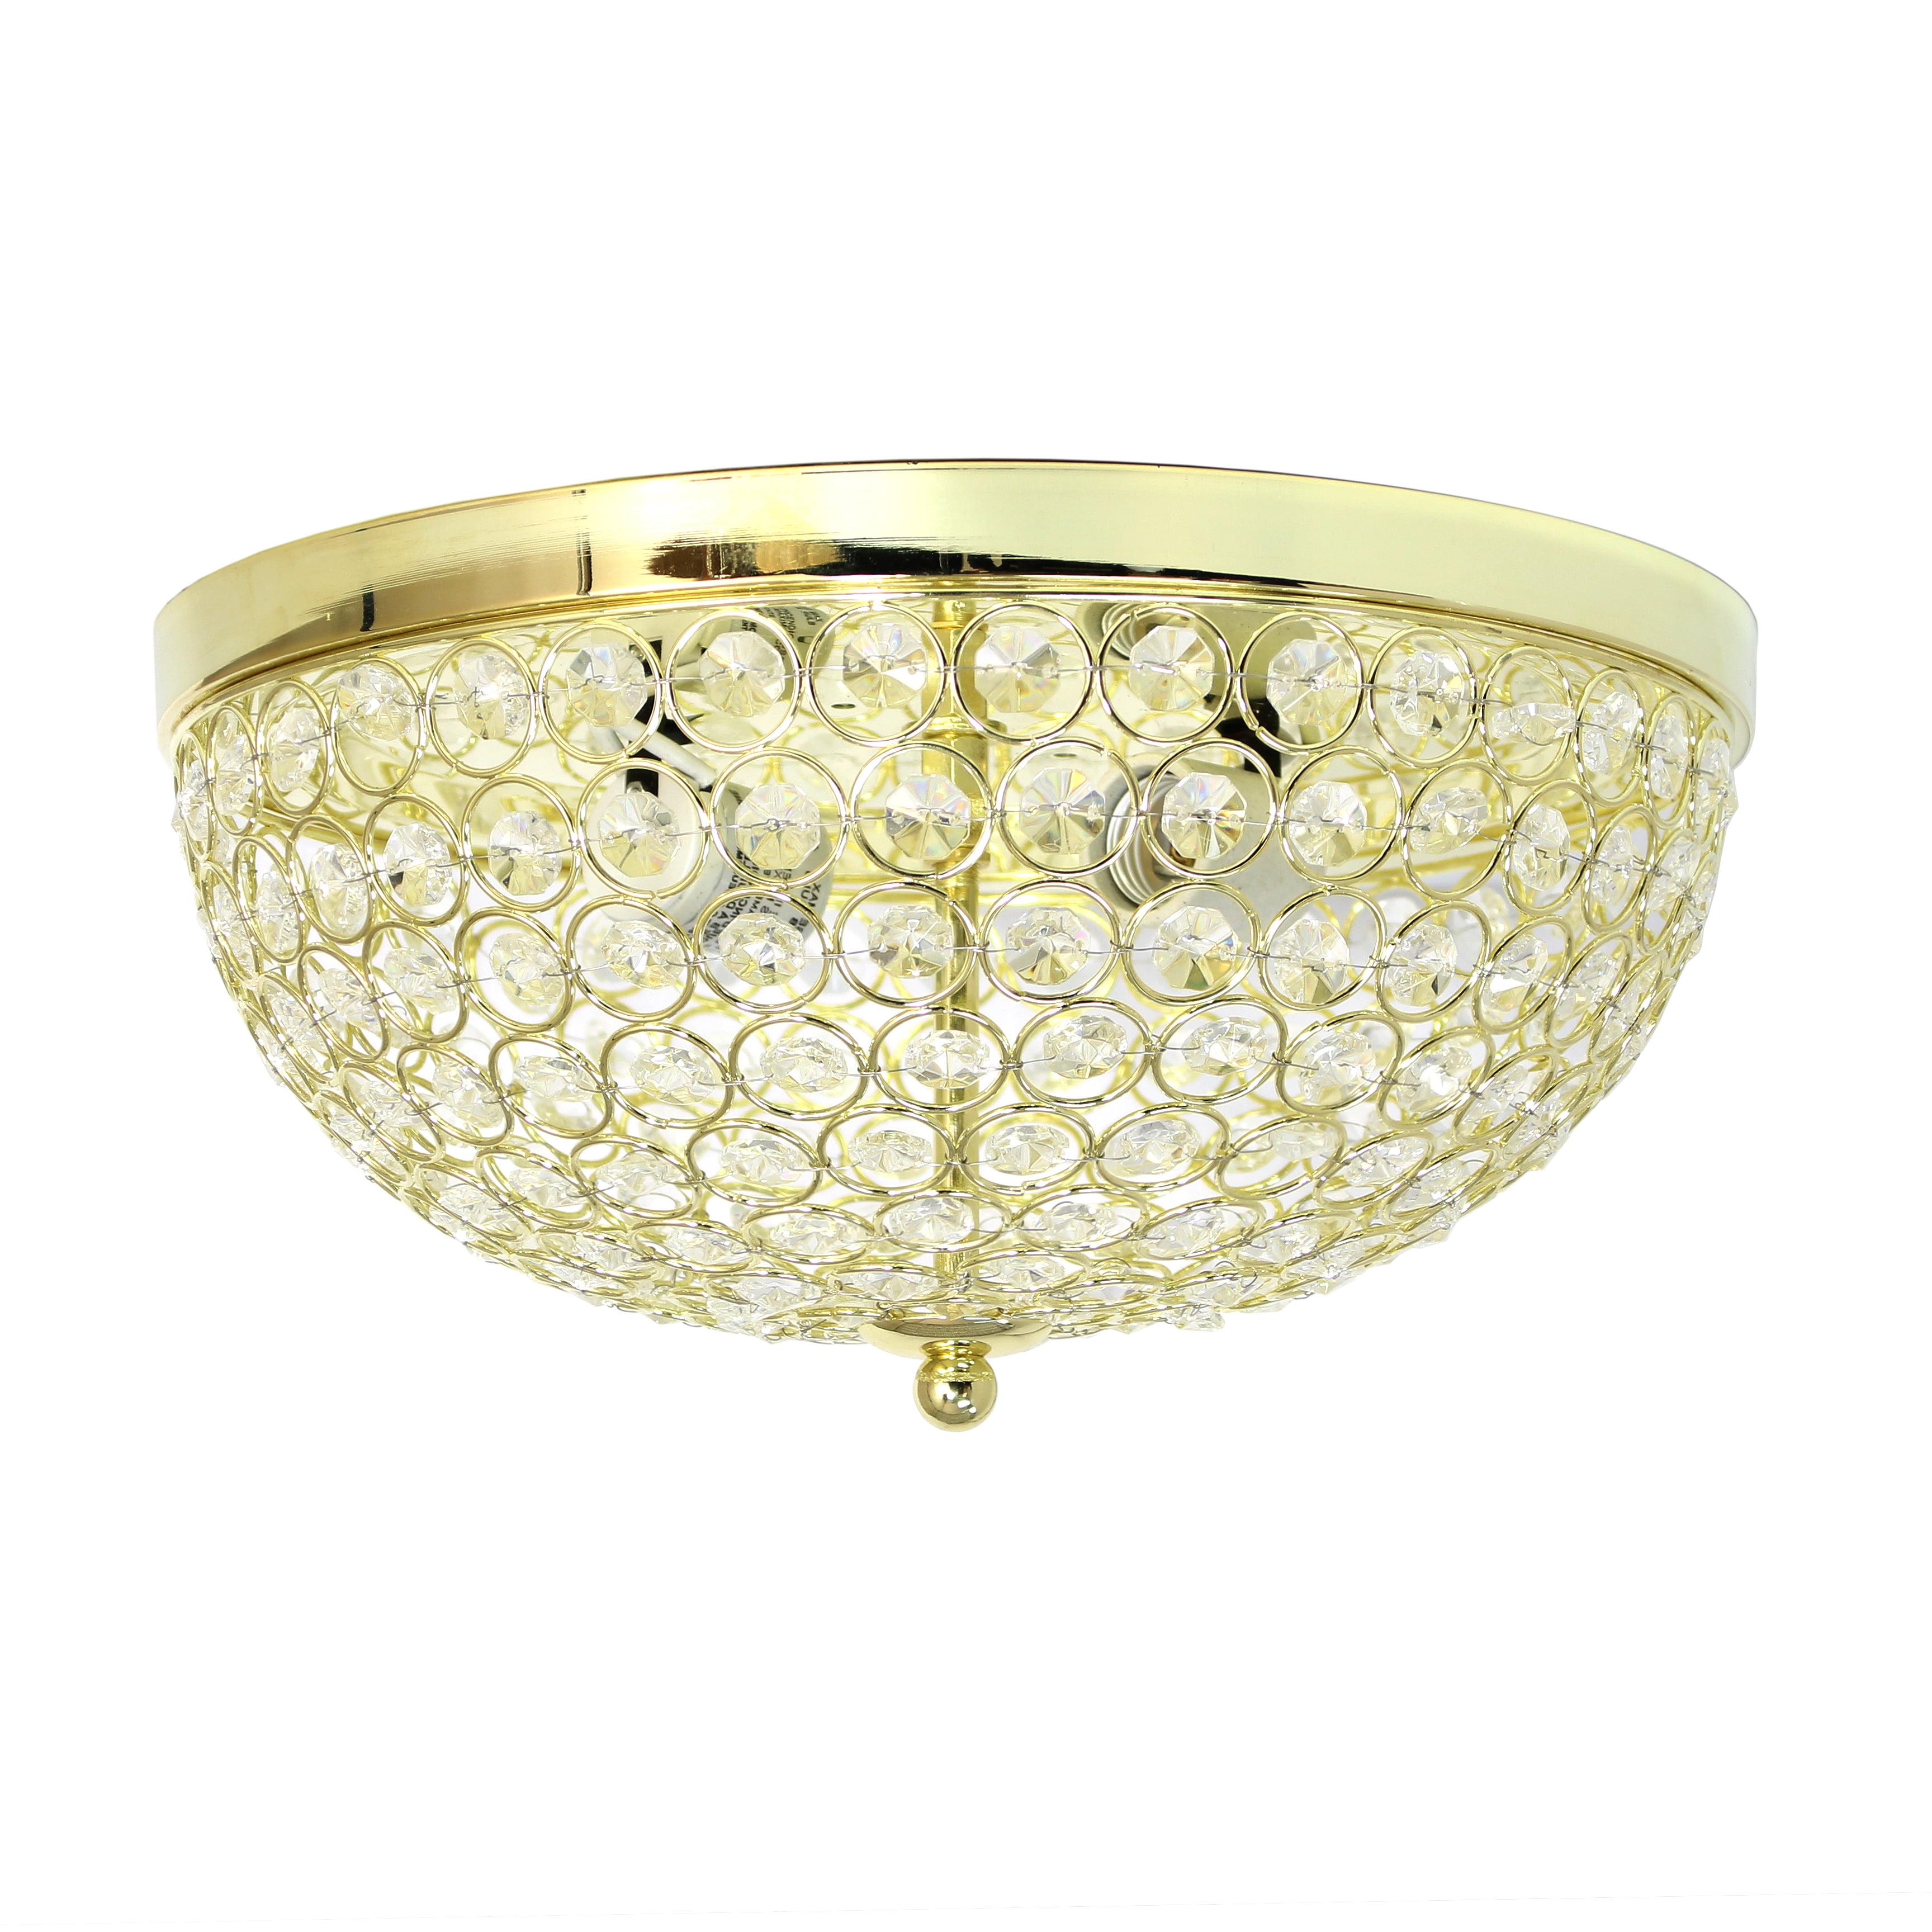 Elegant Designs 2-Light Elipse Crystal Flush Mount Ceiling Light